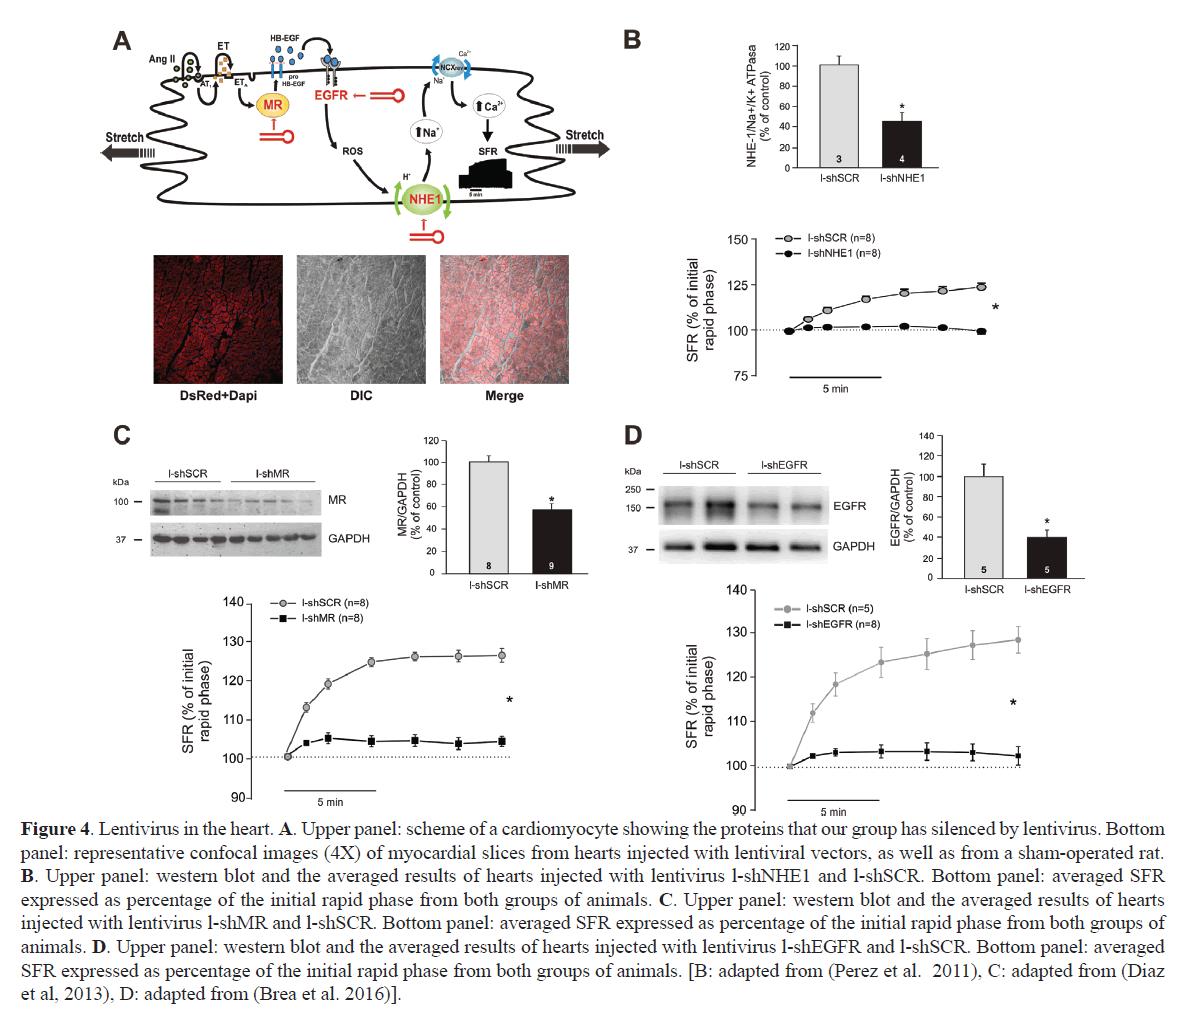 rnai-gene-silencing-myocardial-slices